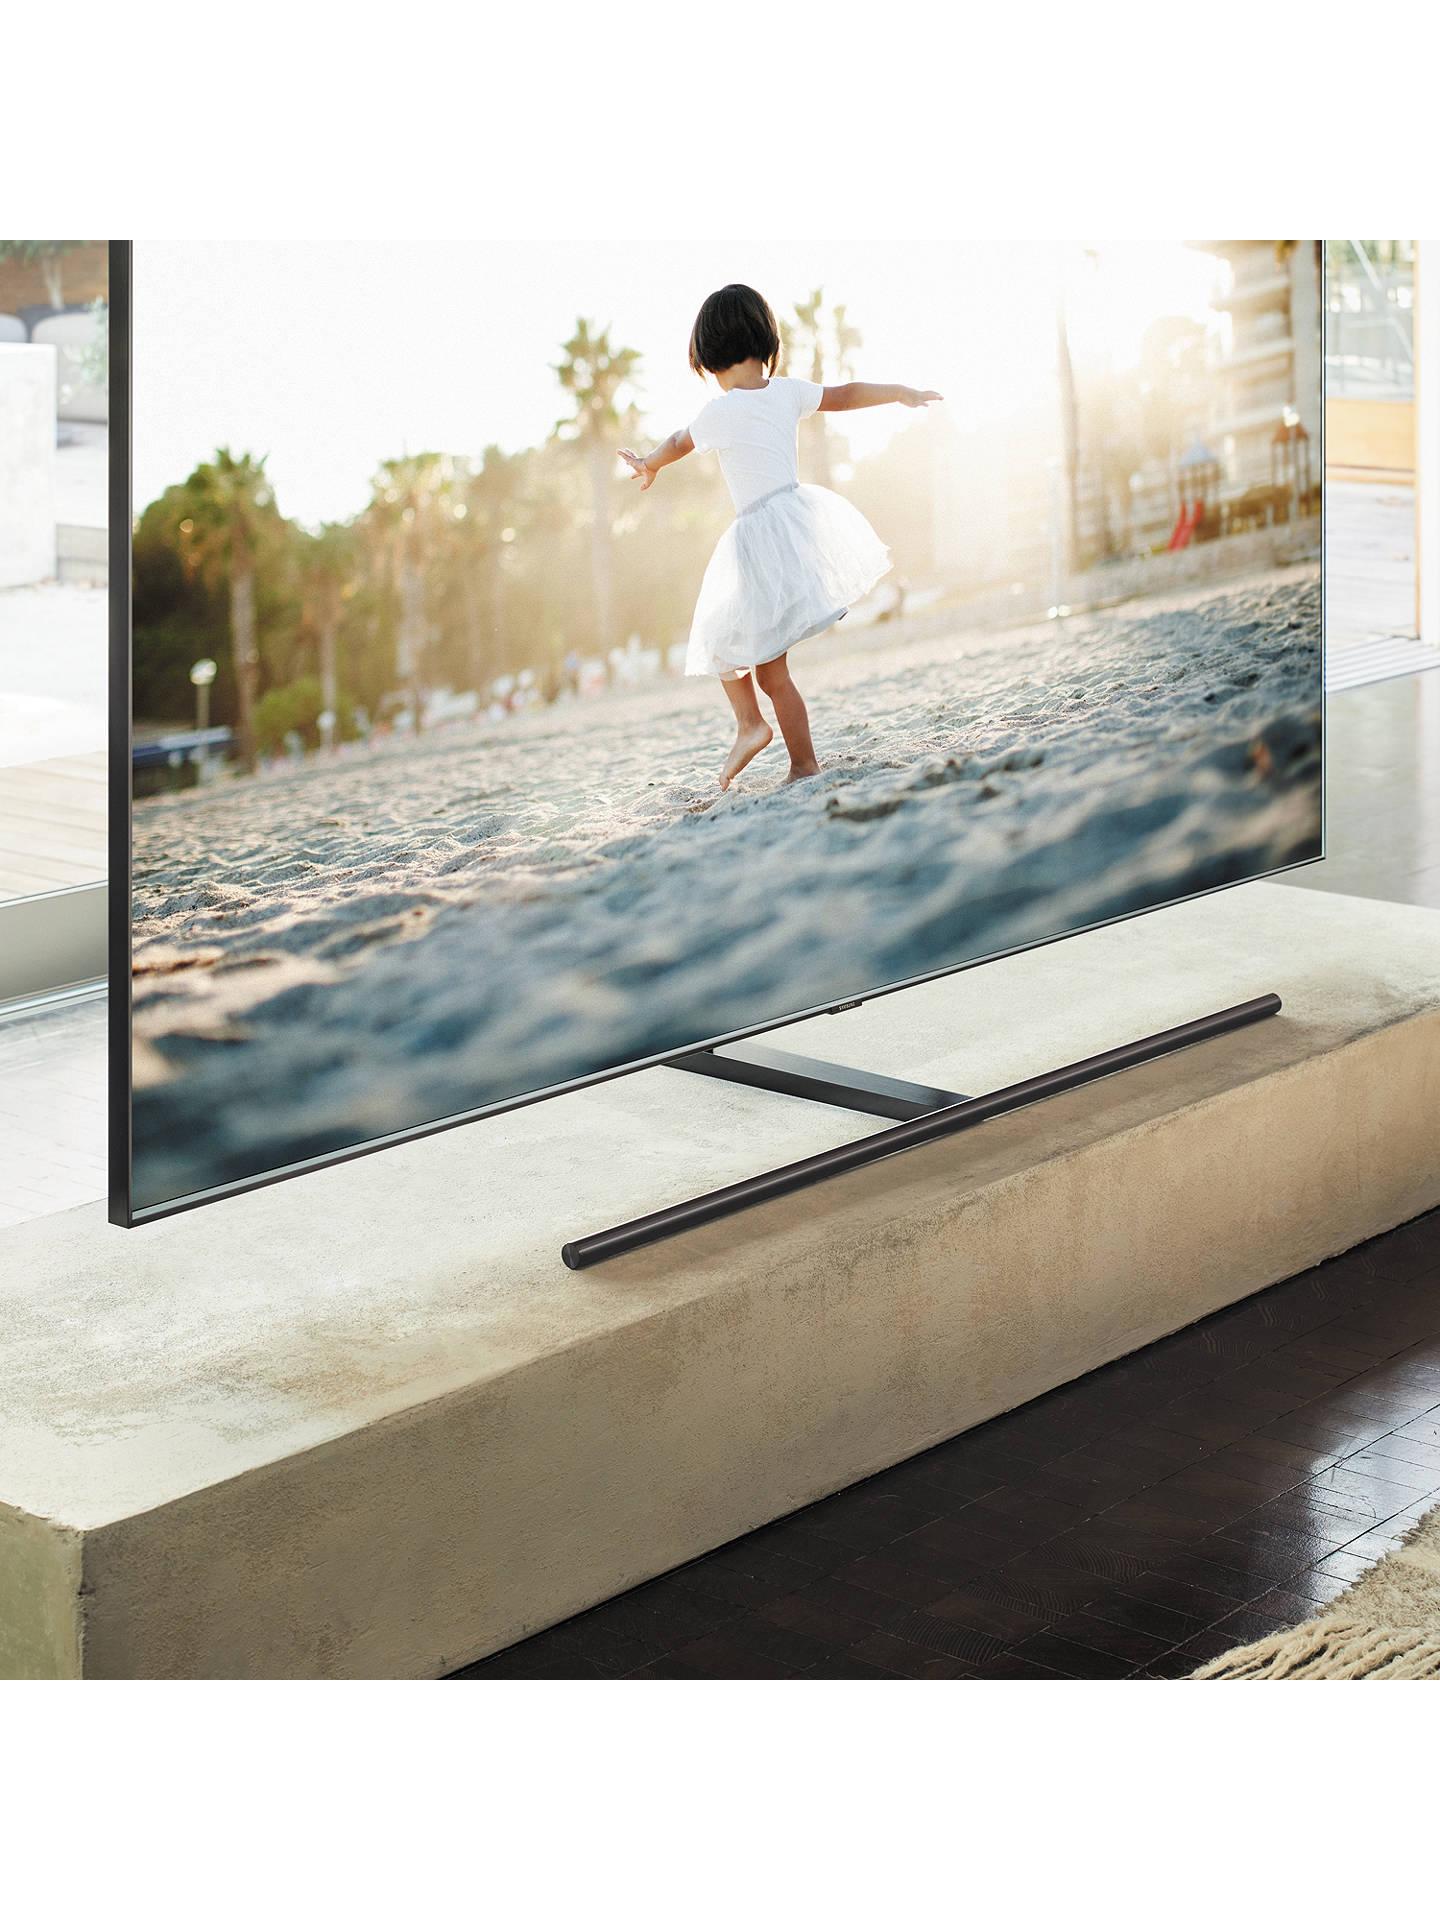 353e42335d35 ... Buy Samsung QE65Q9FN (2018) QLED HDR 2000 4K Ultra HD Smart TV